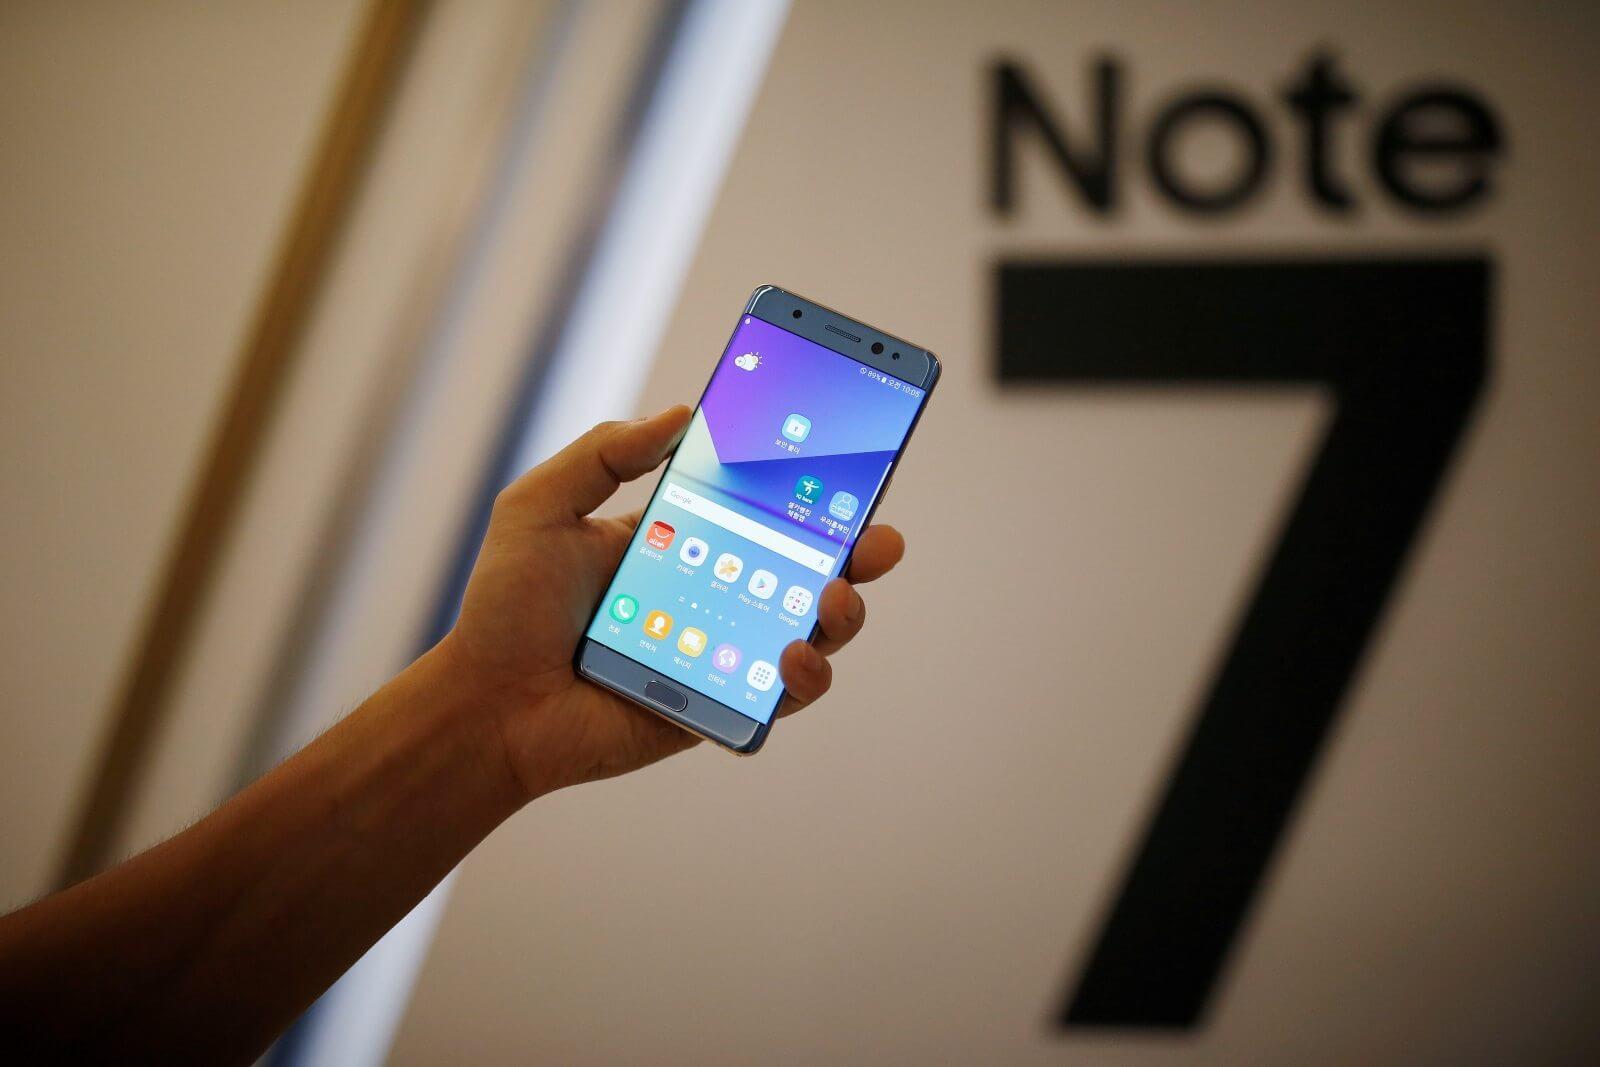 Galaxy Note 7 Caput - Galaxy Note 7 voltará ao mercado ainda este mês